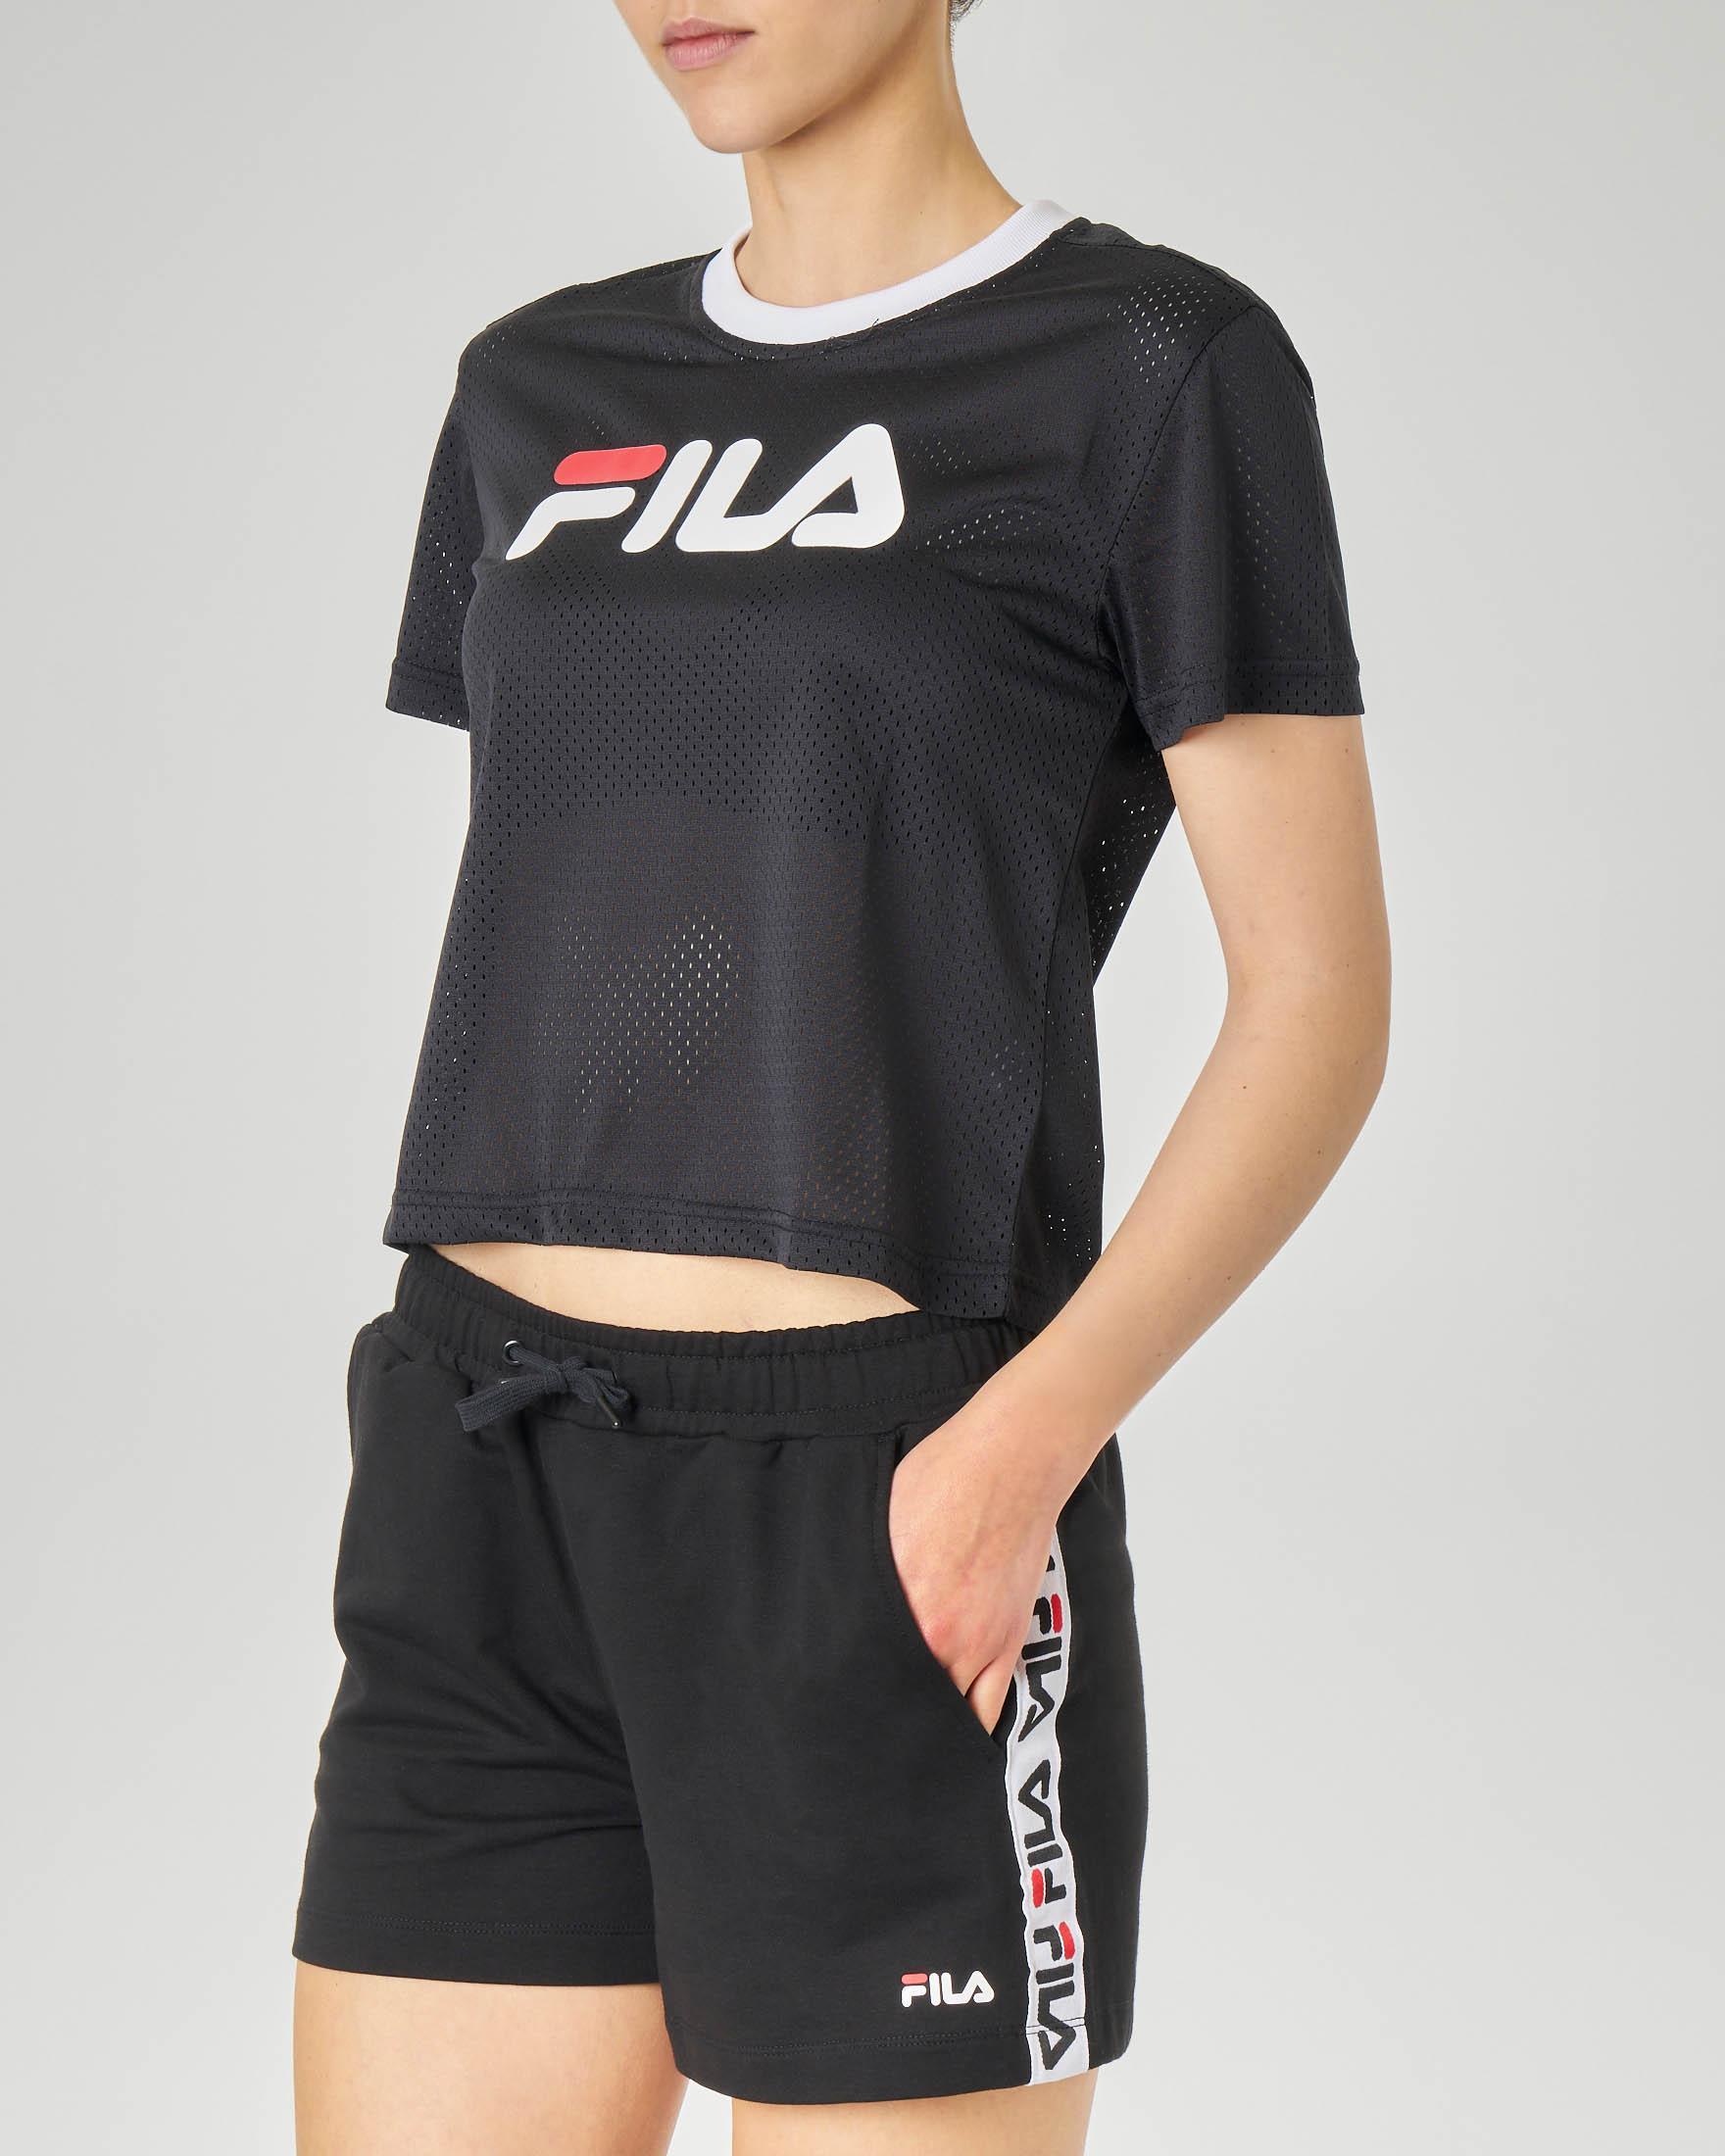 T-shirt cropped nera con motivo trasforato e logo